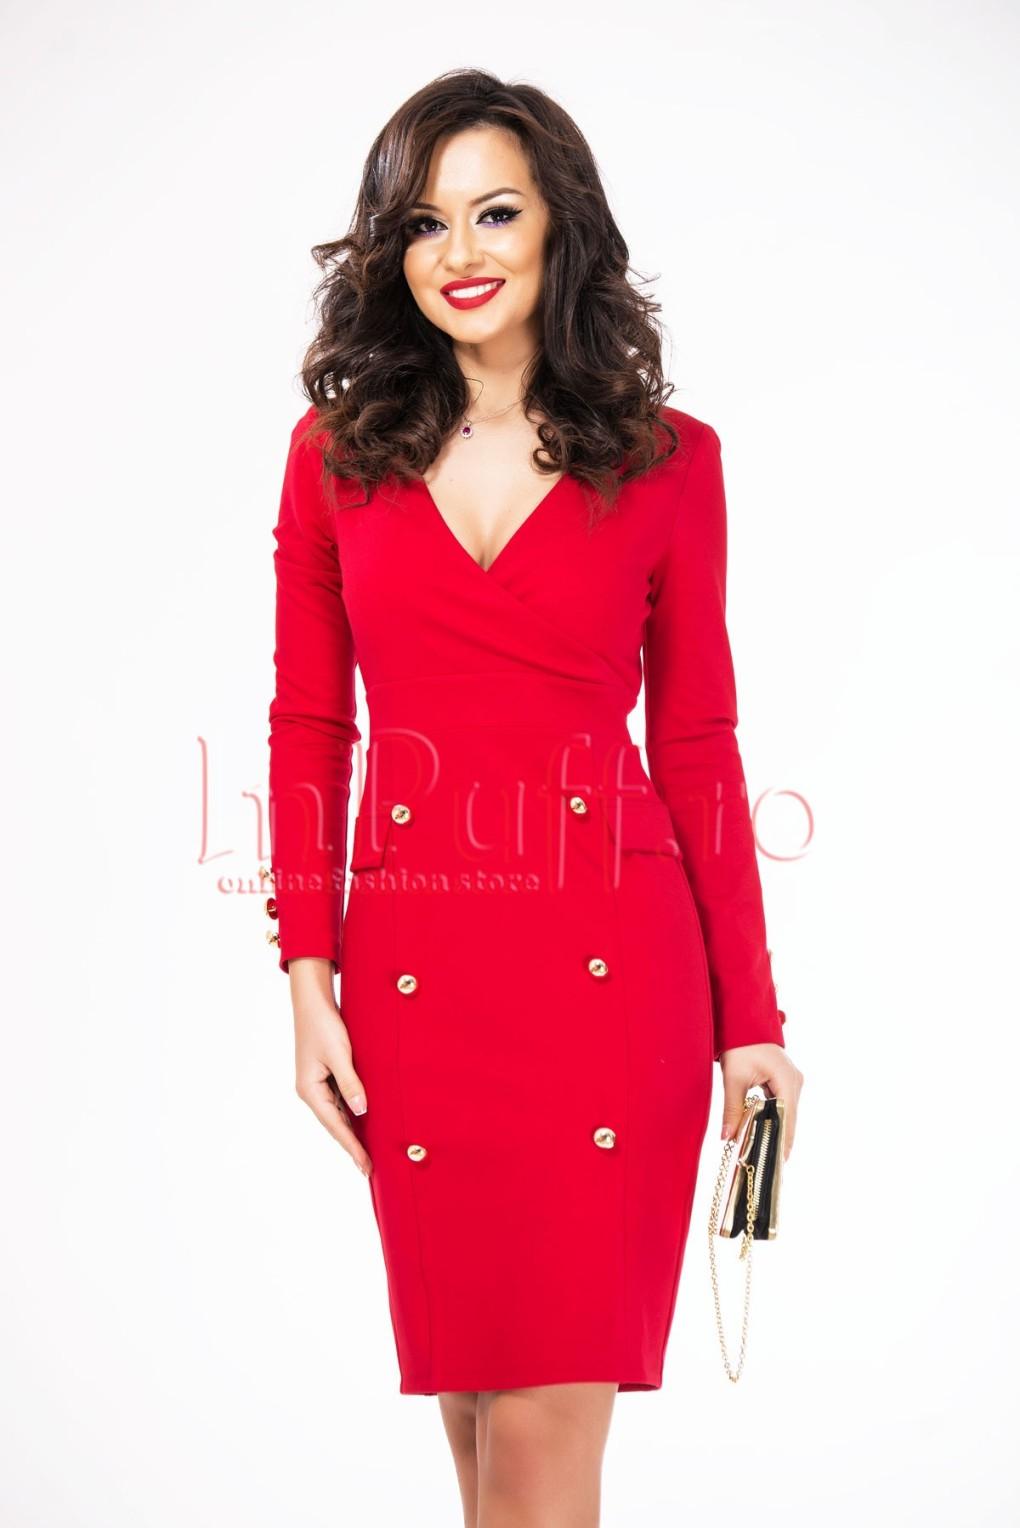 rochie-eleganta-rosie-accesorizata-cu-nasturi-aurii-1516115222-4